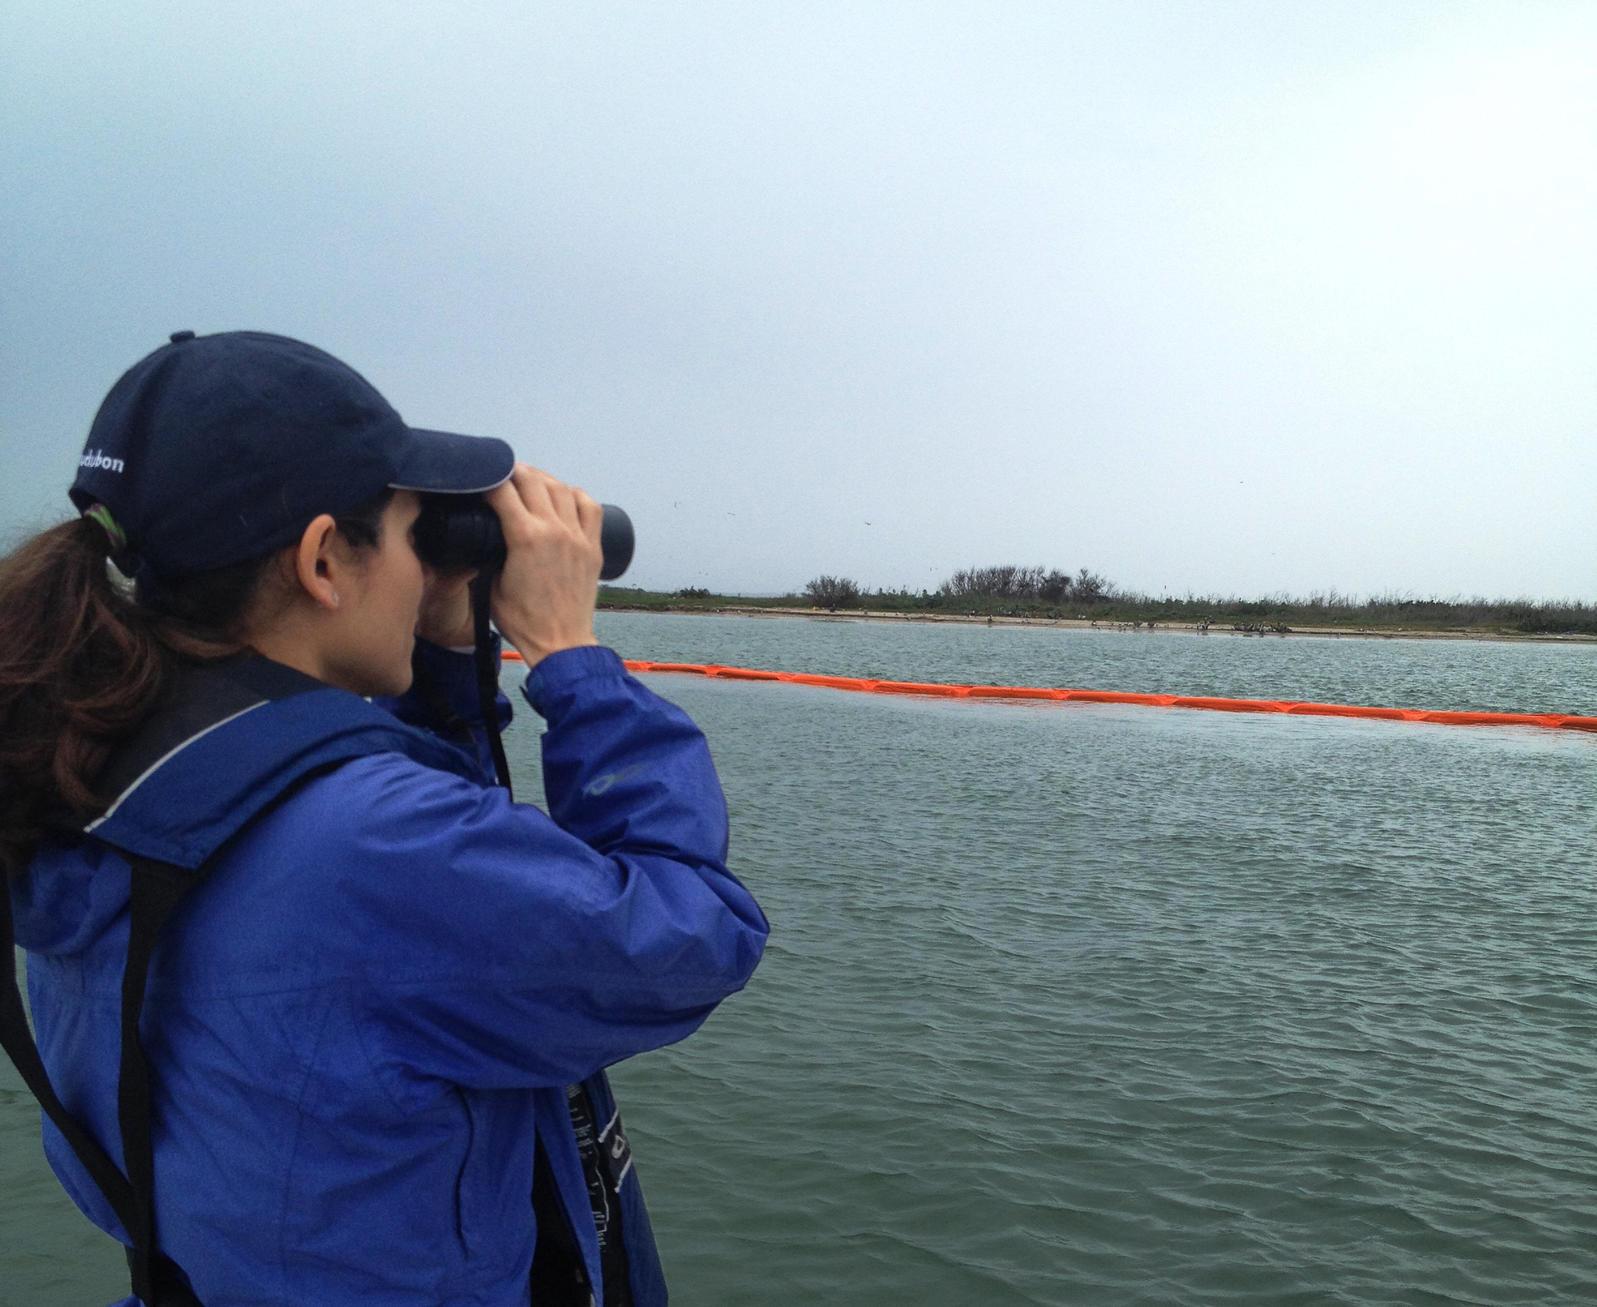 Audubon Texas Director of Conservation Iliana Peña surveying Sundown Island (Chester Island) in Matagorda Bay. -Sundown Island photographs taken March, 27th, 2014.   Photograph by Peggy Wilkinson